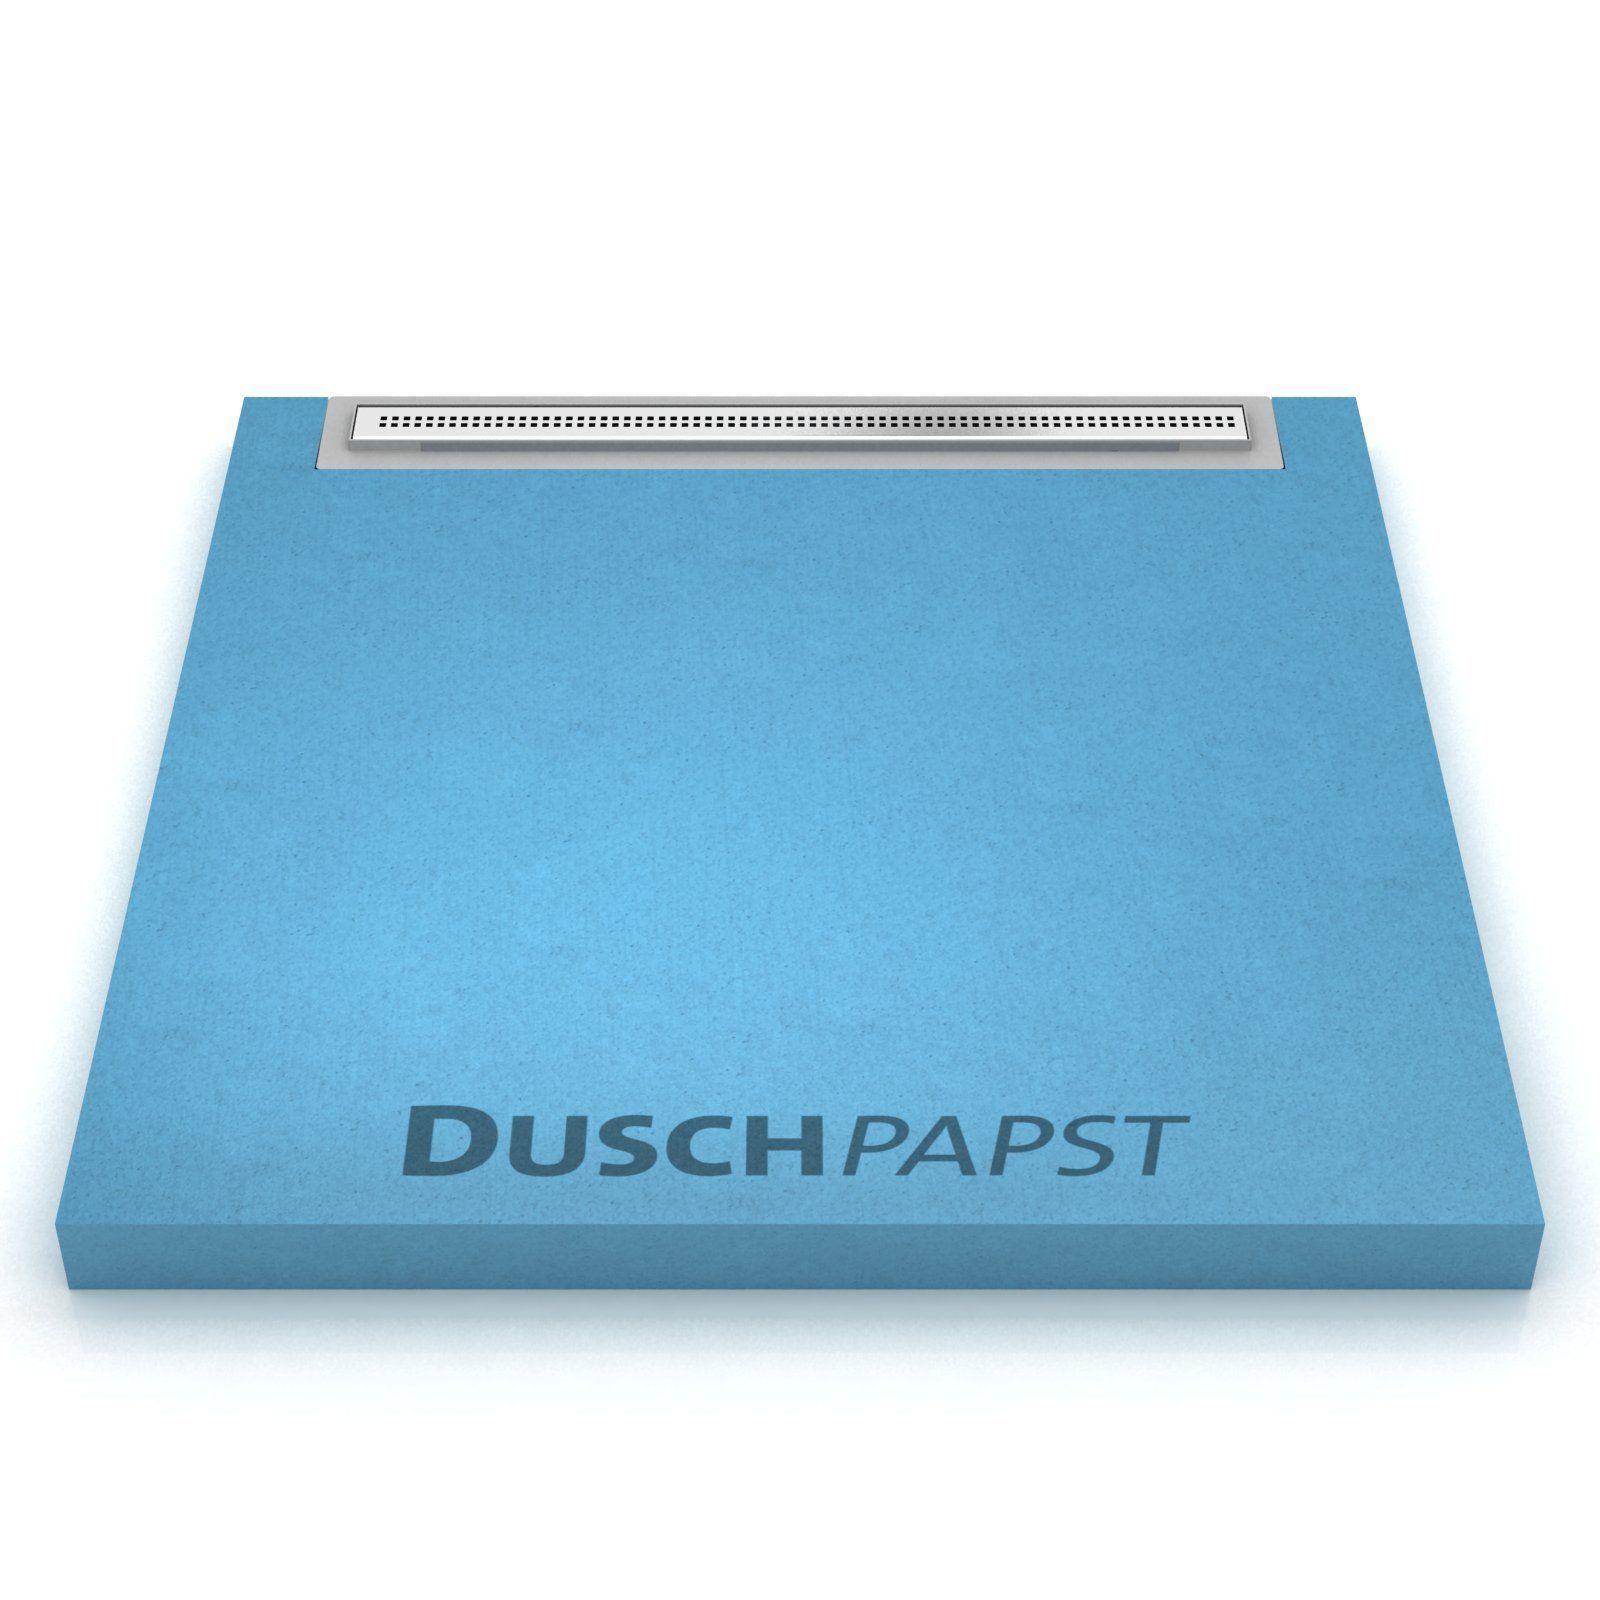 Duschelement Multiboard Varioboard Universalboard